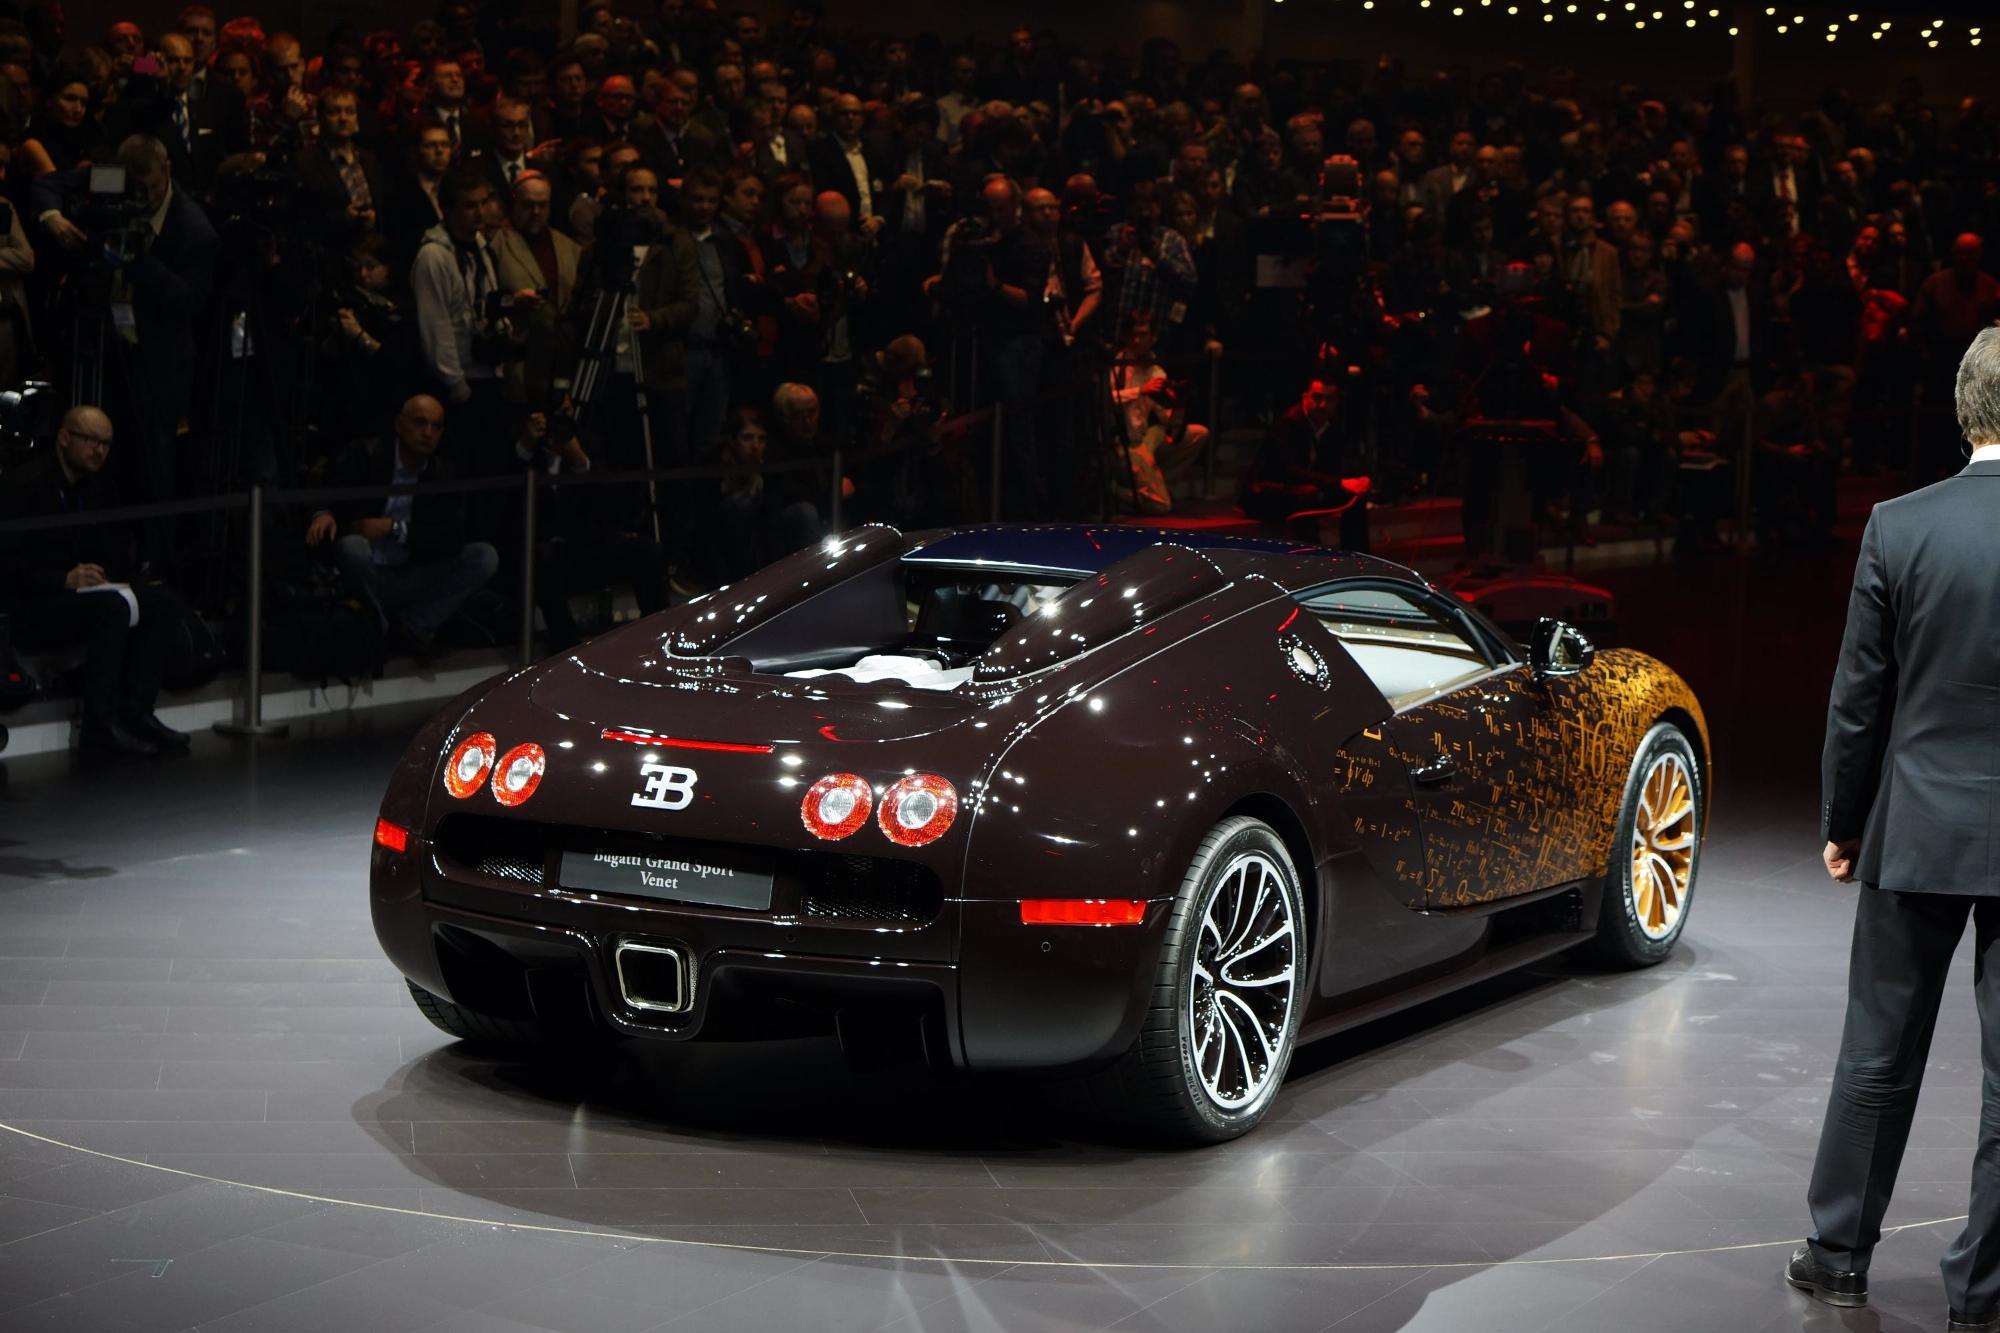 bugatti-veyron-grand-sport-venet-is-a-rusty-piece-of-art-live-photos_5 Gorgeous Bugatti Veyron Grand Sport Vitesse Bleu Cars Trend